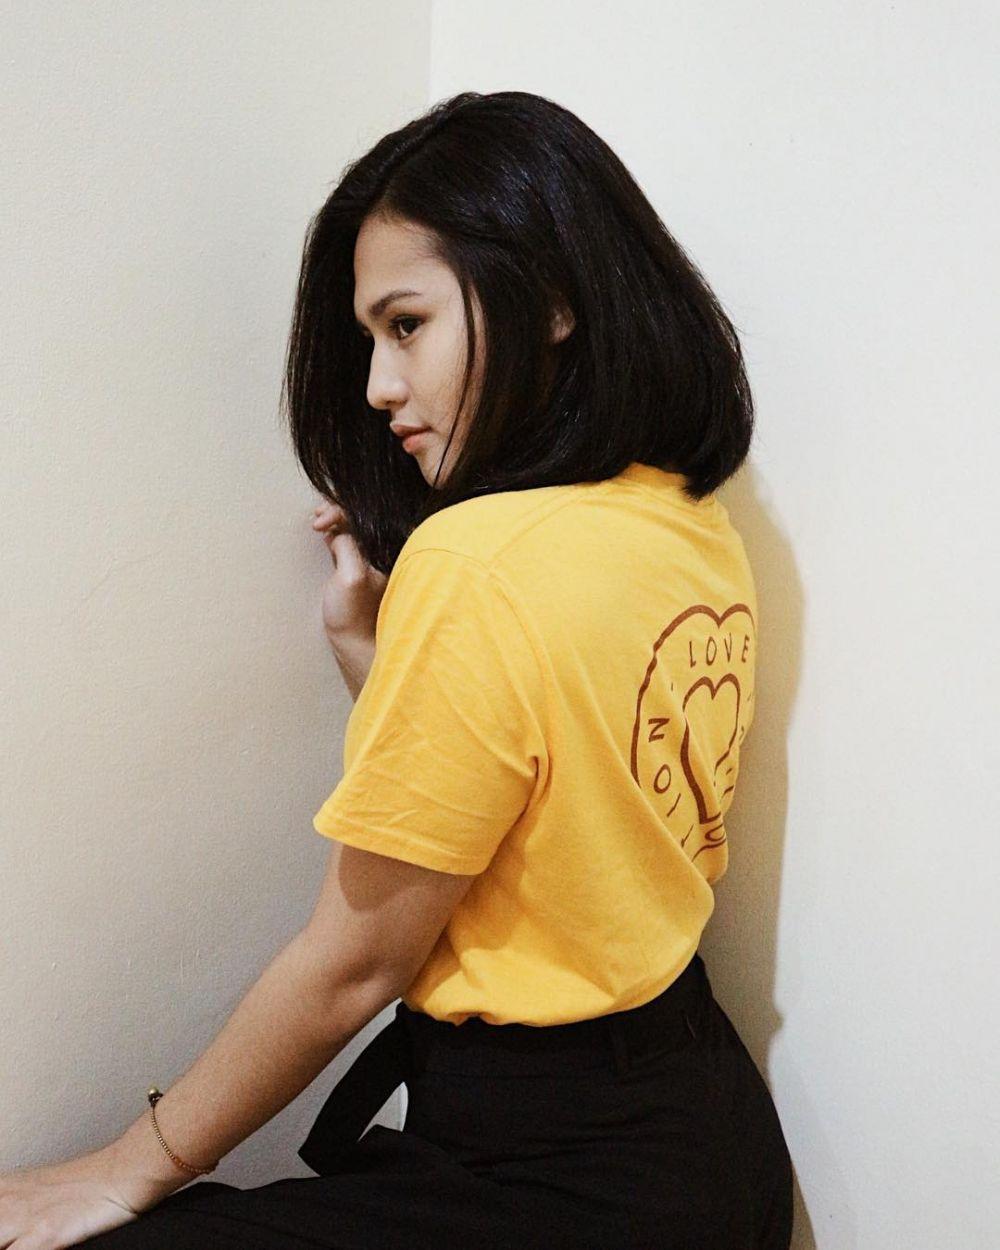 outfit Ceyco Georgia © 2018 Instagram